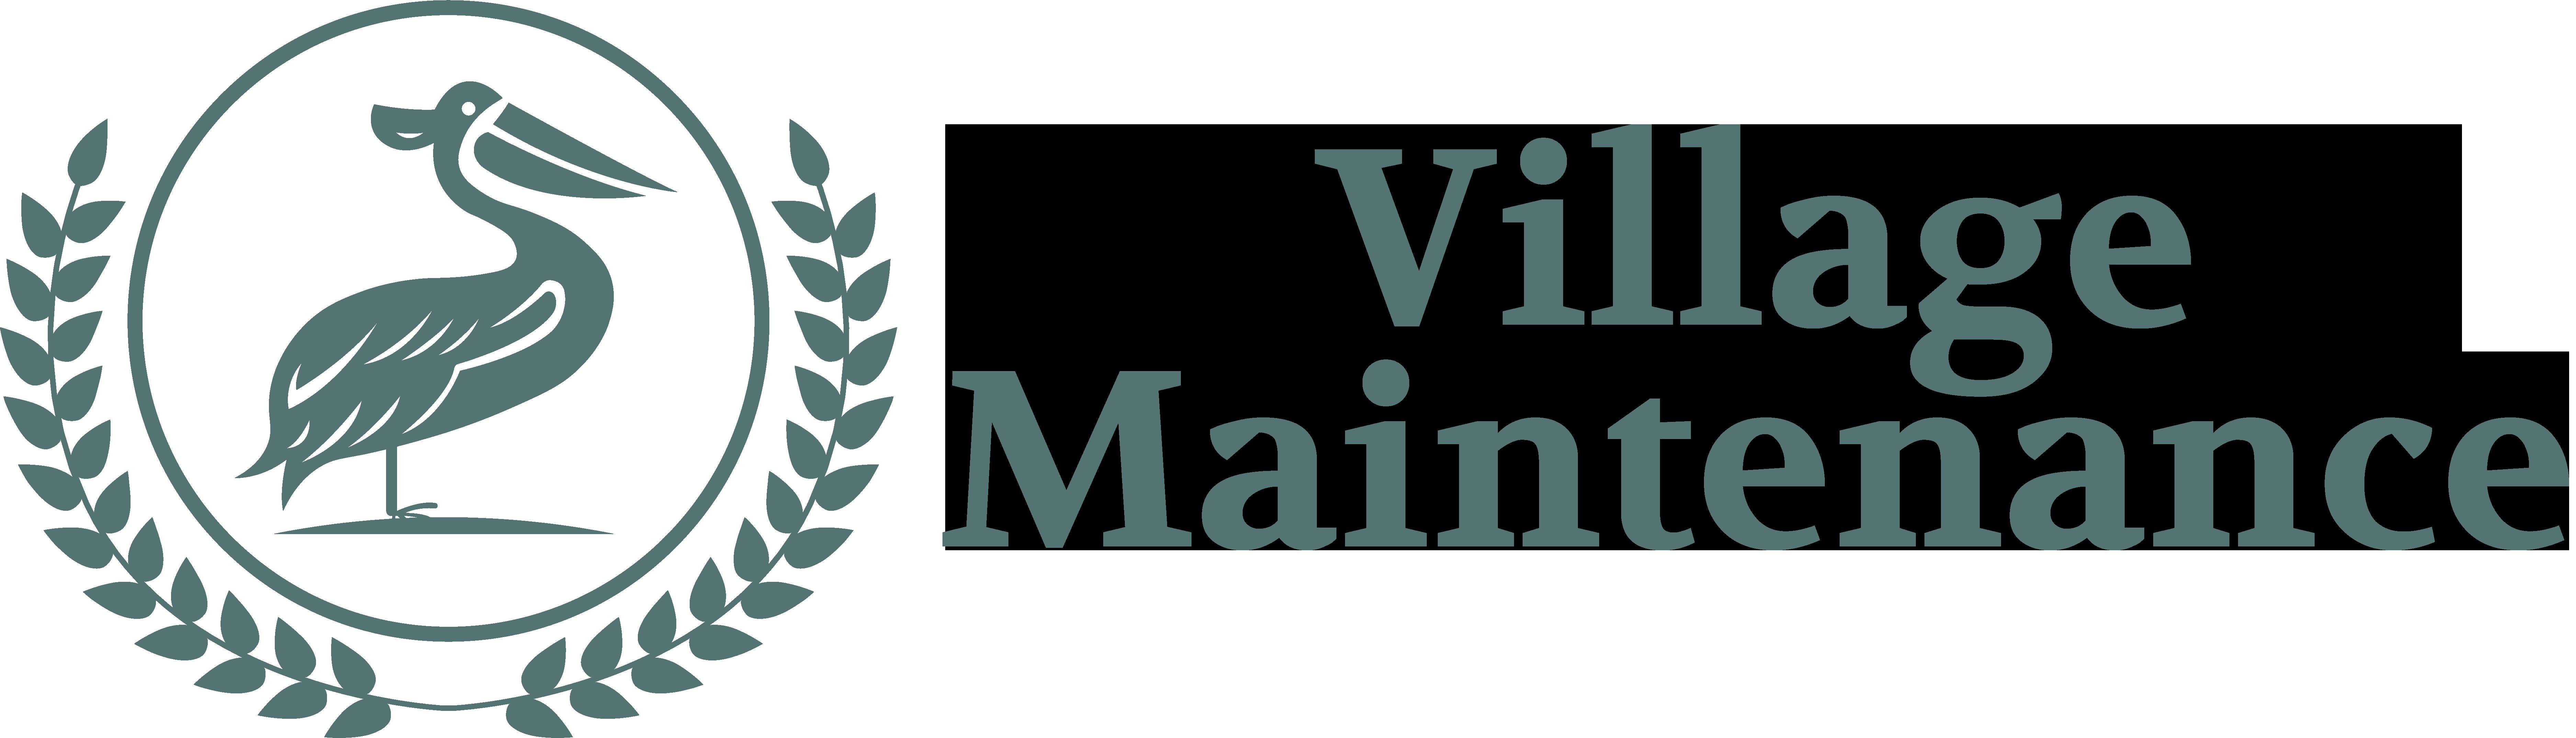 Village Maintenance